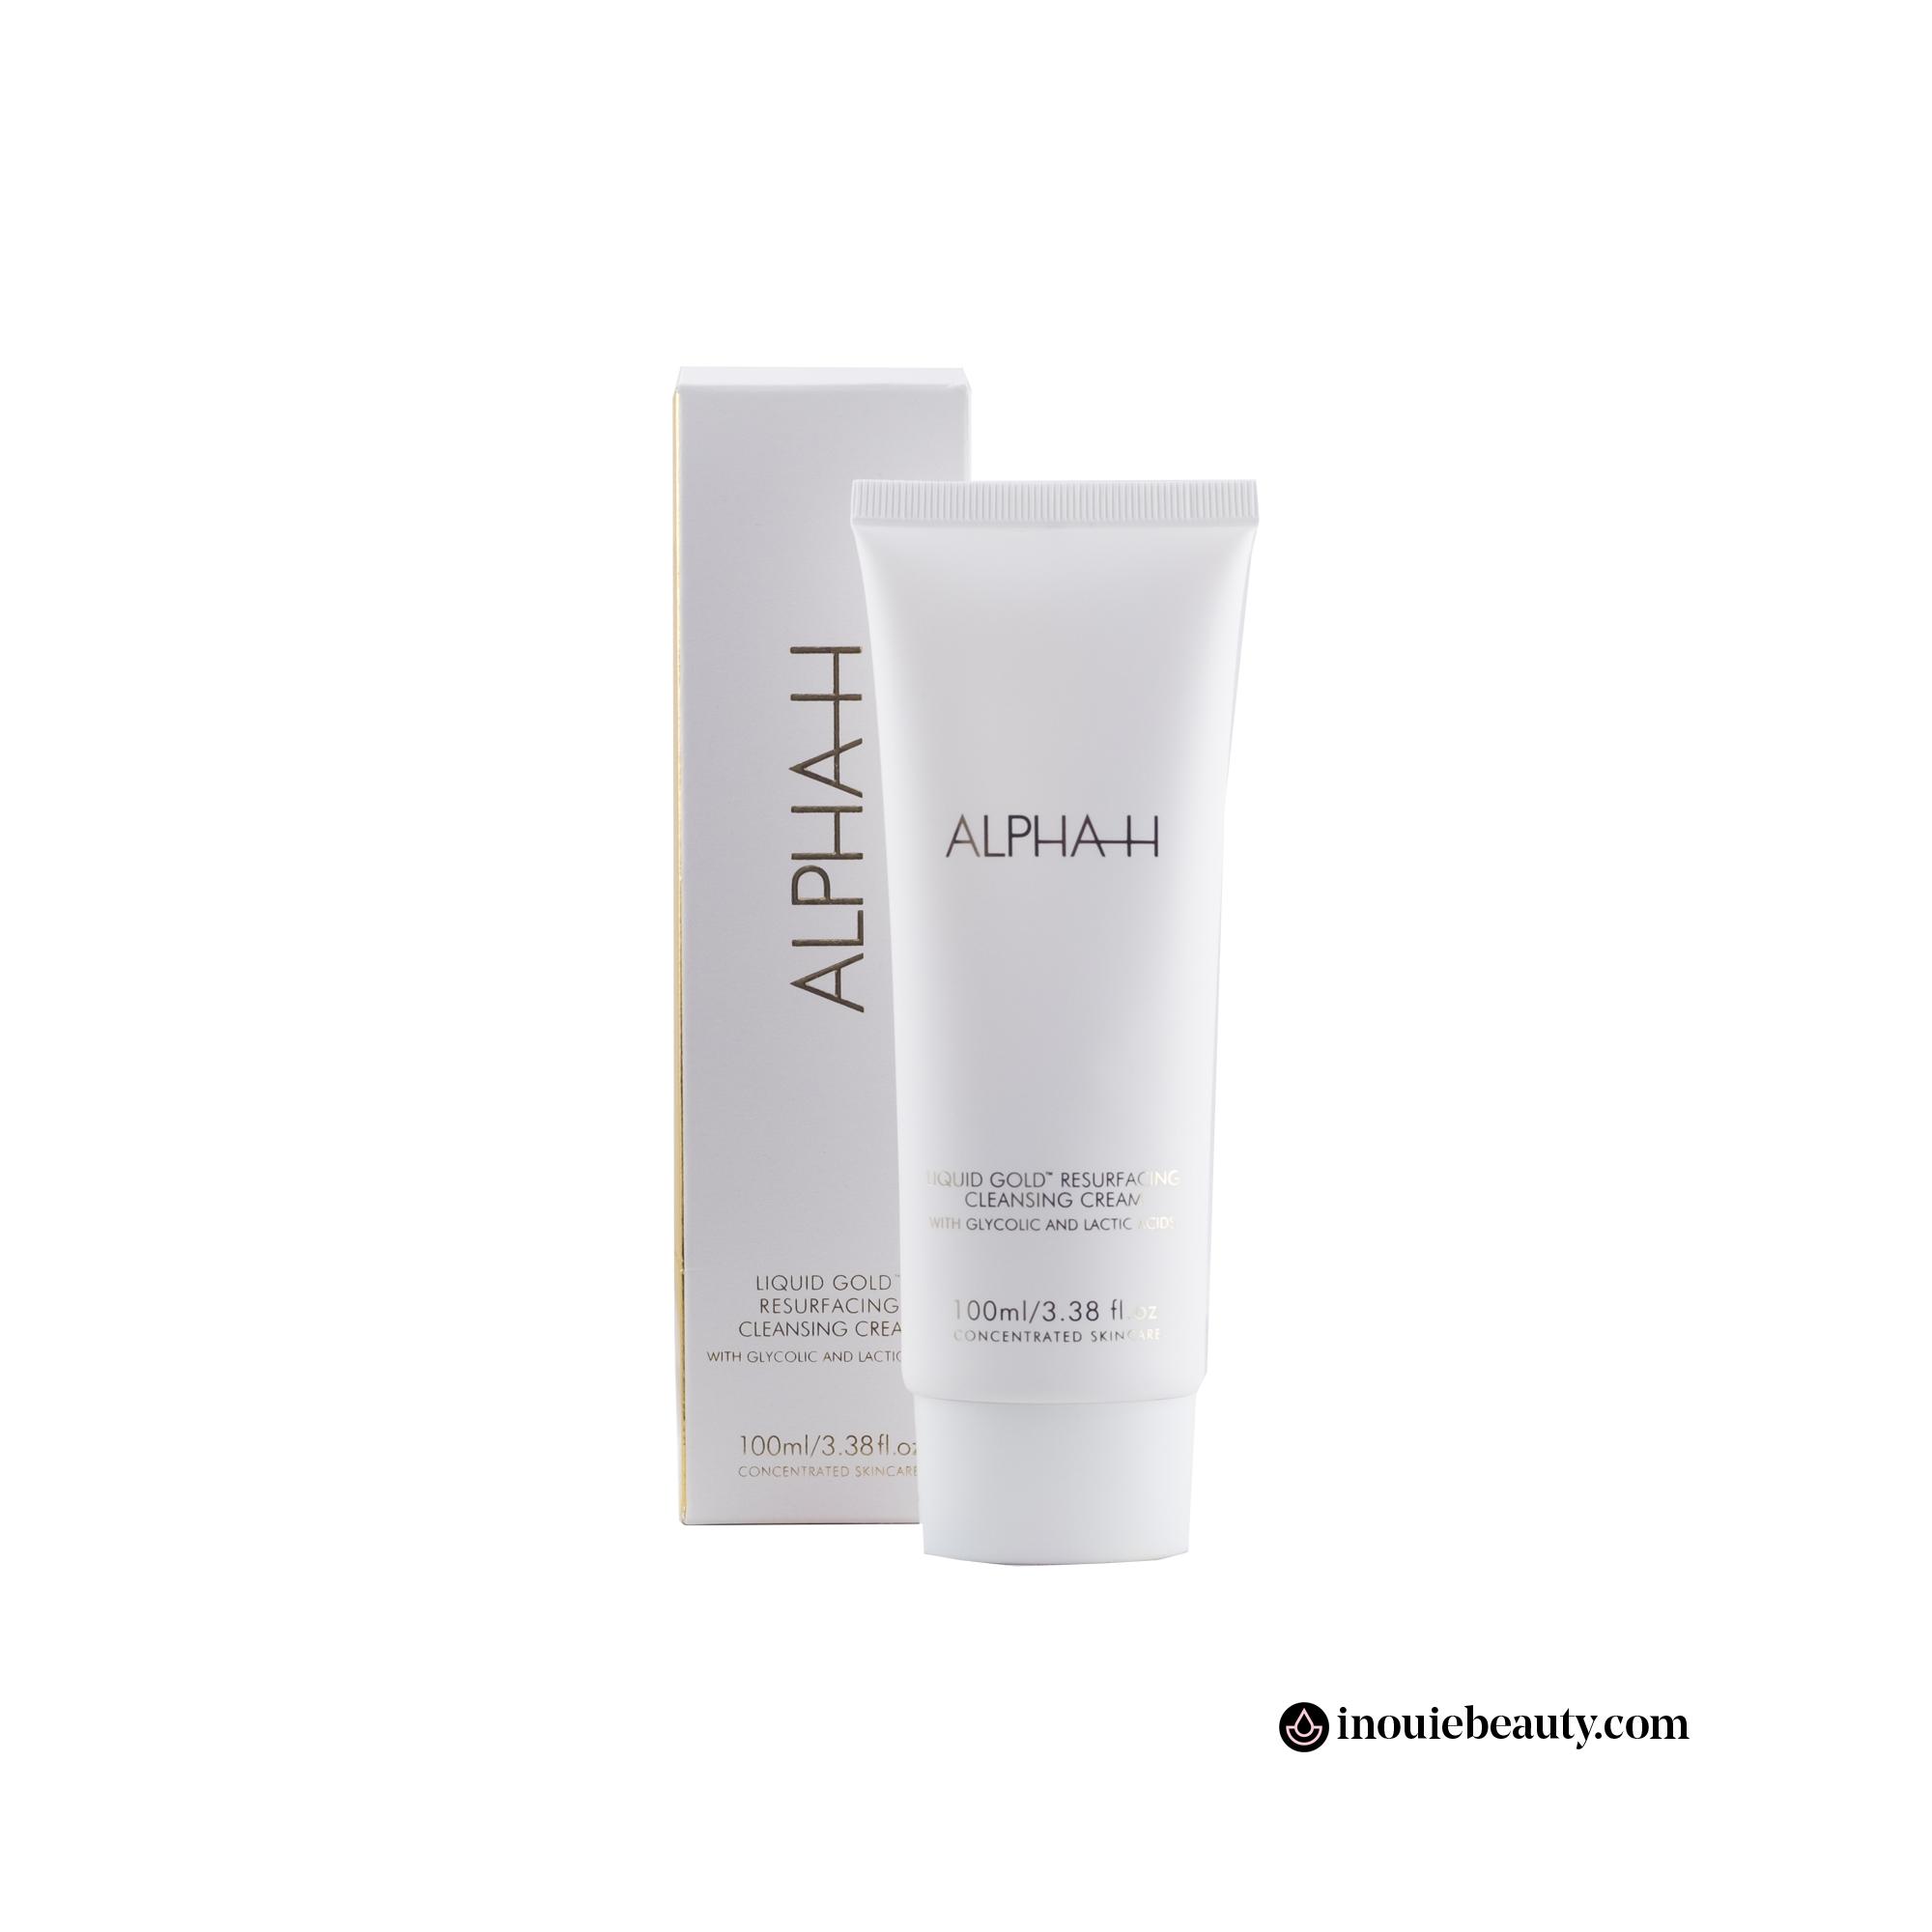 Alpha-H Liquid Gold Resurfacing Cleansing Cream